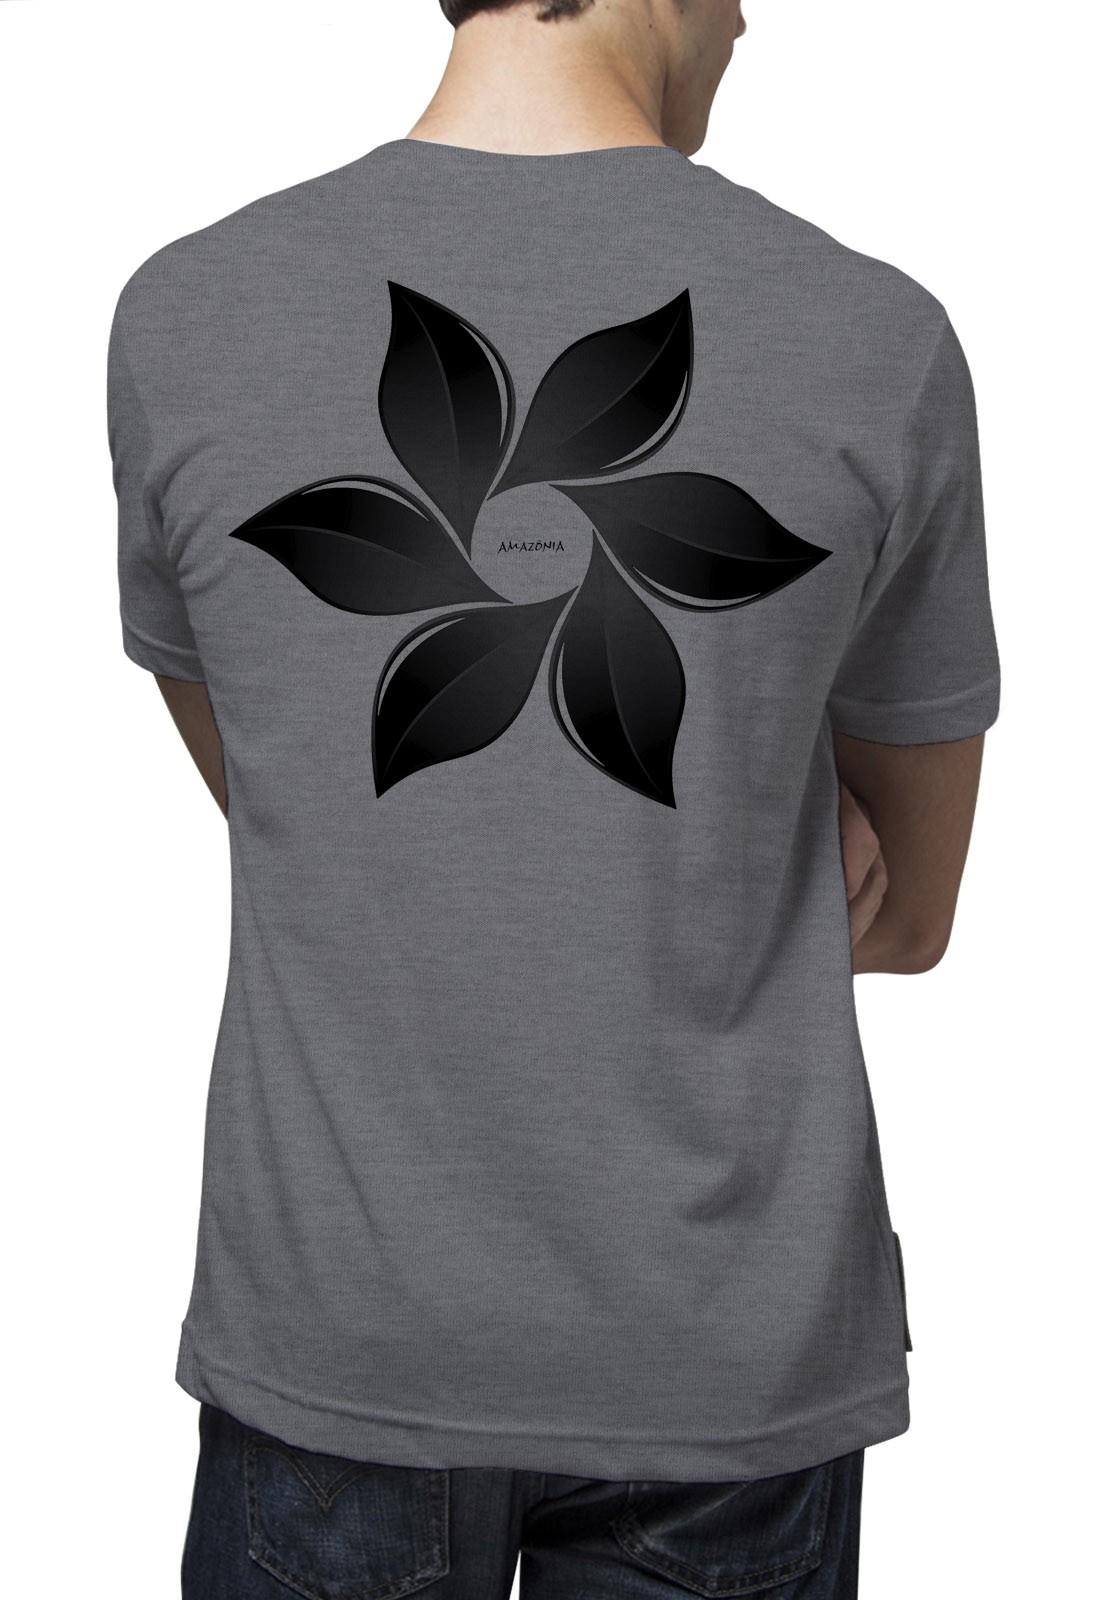 Camiseta Amazônia Catavento - Mescla Escuro